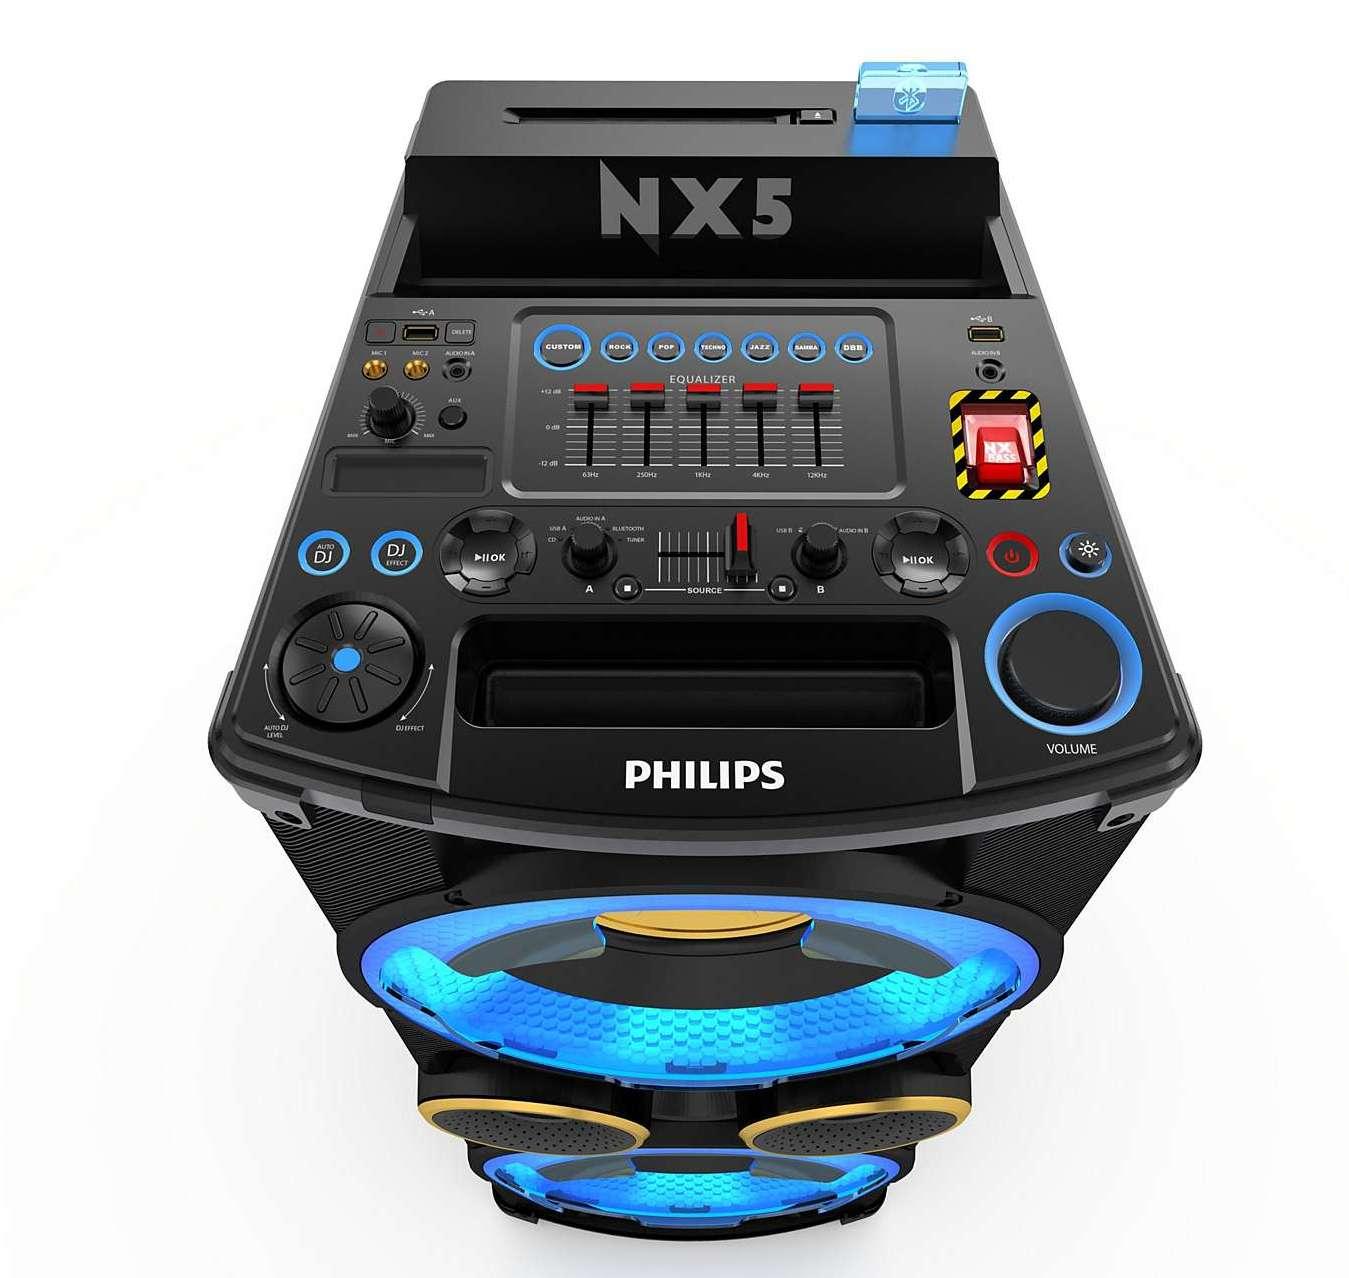 NTRX500_10-D3P-global-001